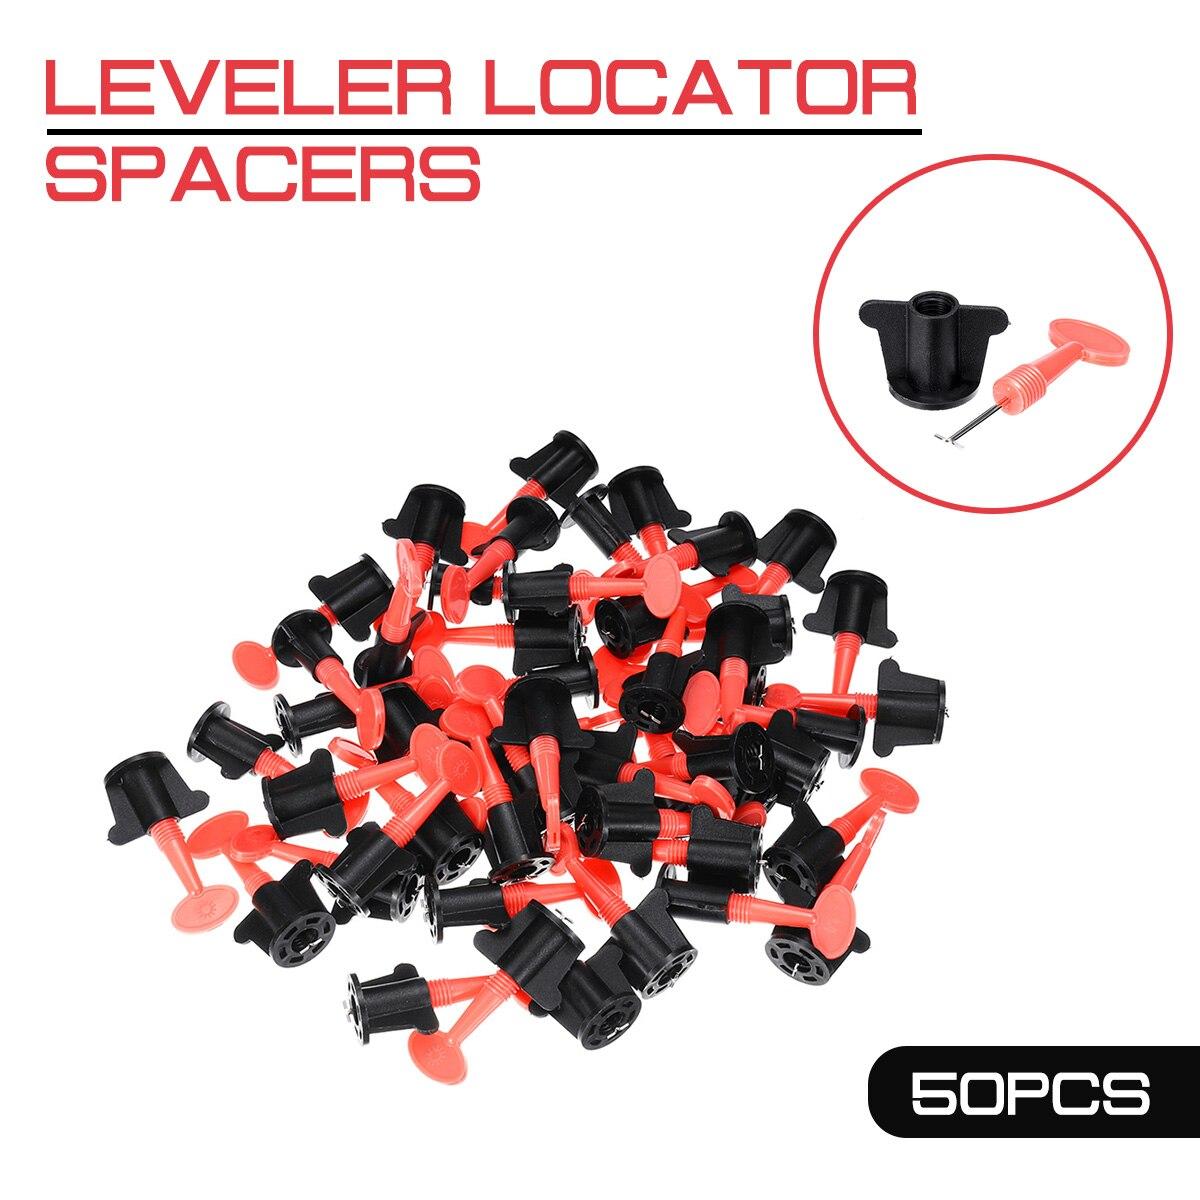 New 50pcs/set Level Wedges Tile Spacers Leveler Locator Spacers Plier For Flooring Wall Tile Carrelage Leveling System